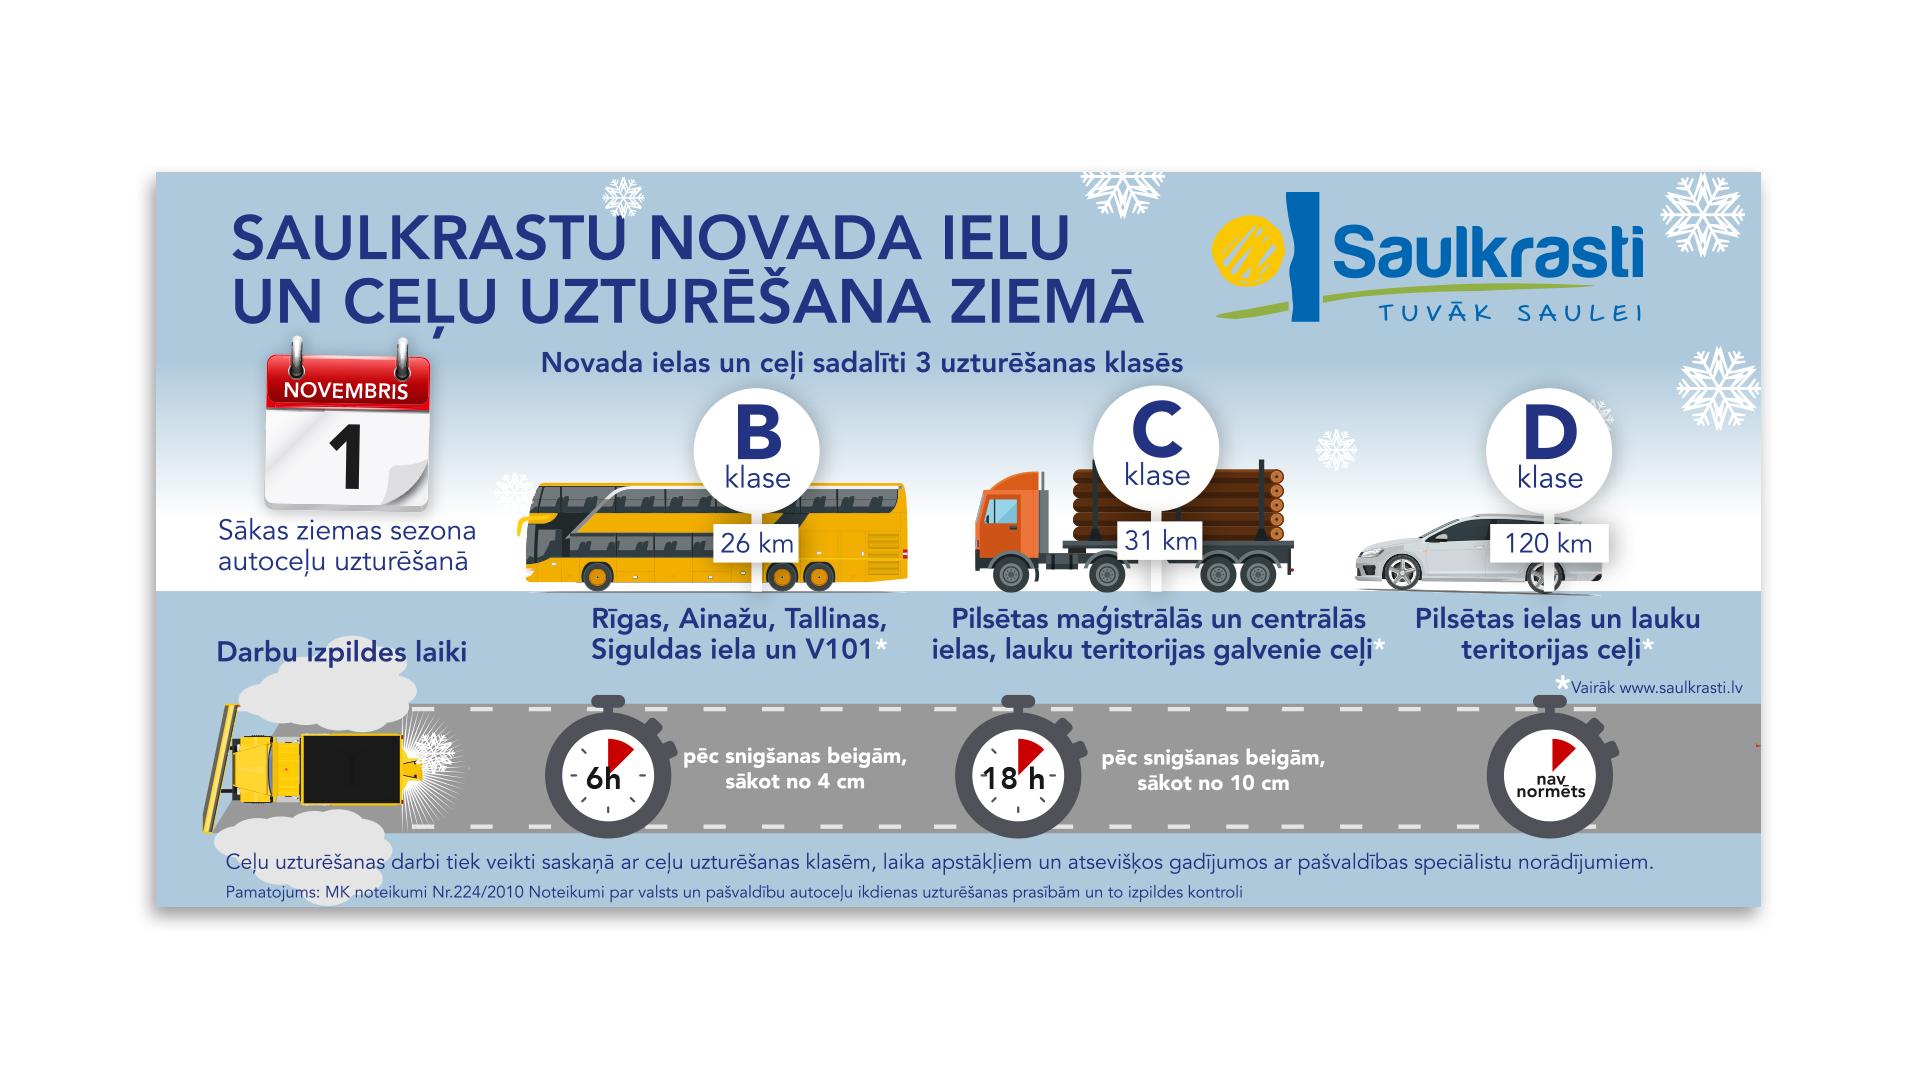 Saulkrastu-celu-infografika-5.12.2018-avizei_1920x1080